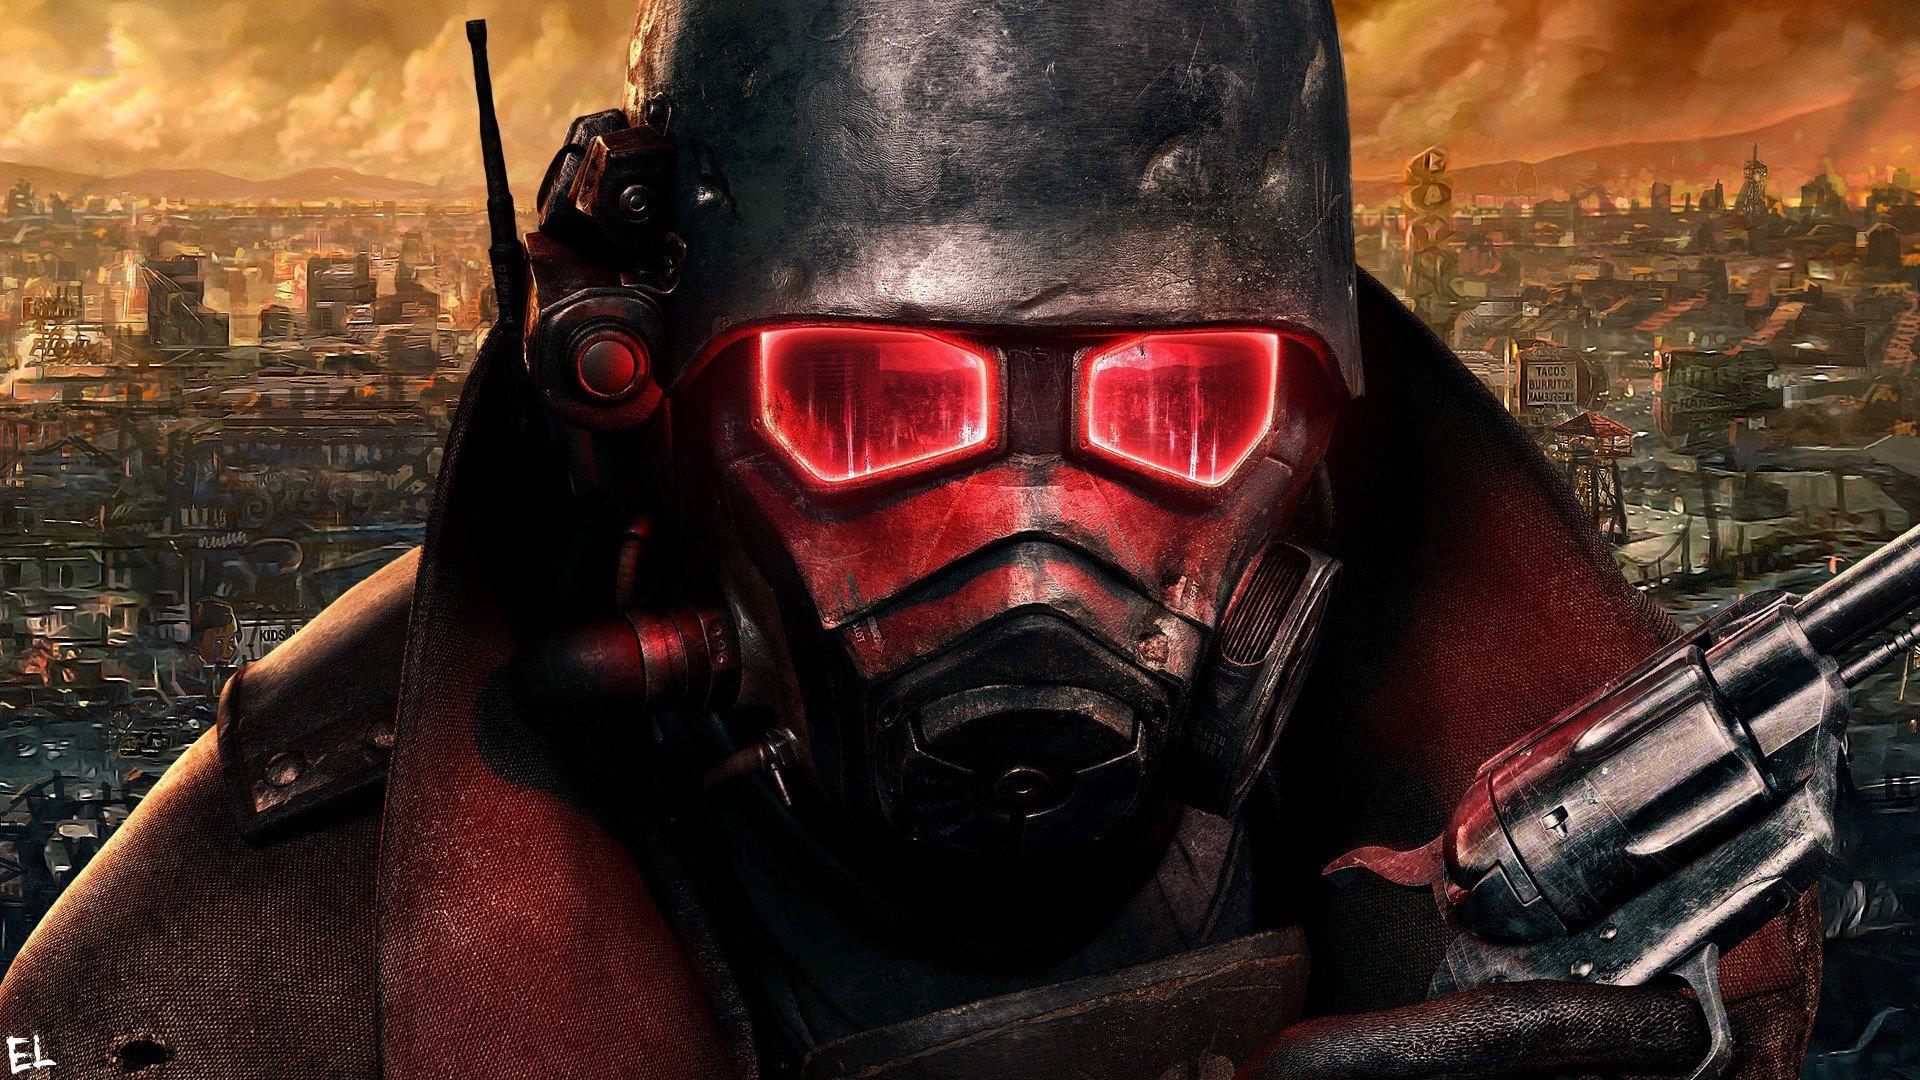 Fallout Fallout Wallpaper 1920x1080 Fallout Fallout New Vegas 1920x1080